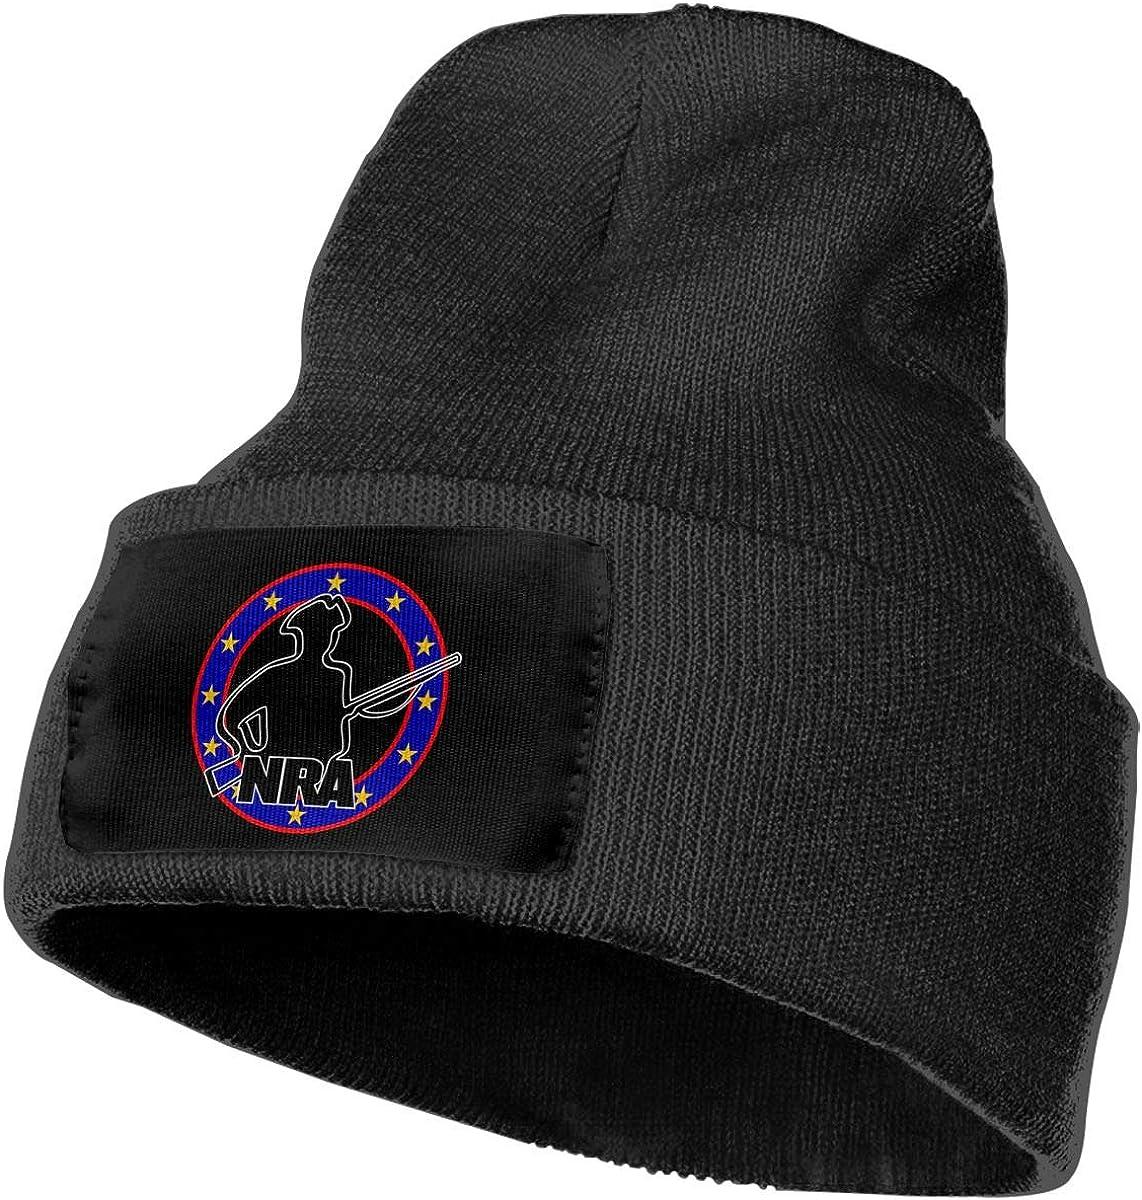 Thick,Soft,Warm Slouchy Knit Hat Winter Soft Ski Cap Feeke Mens/&Womens NRA Beanie Cap